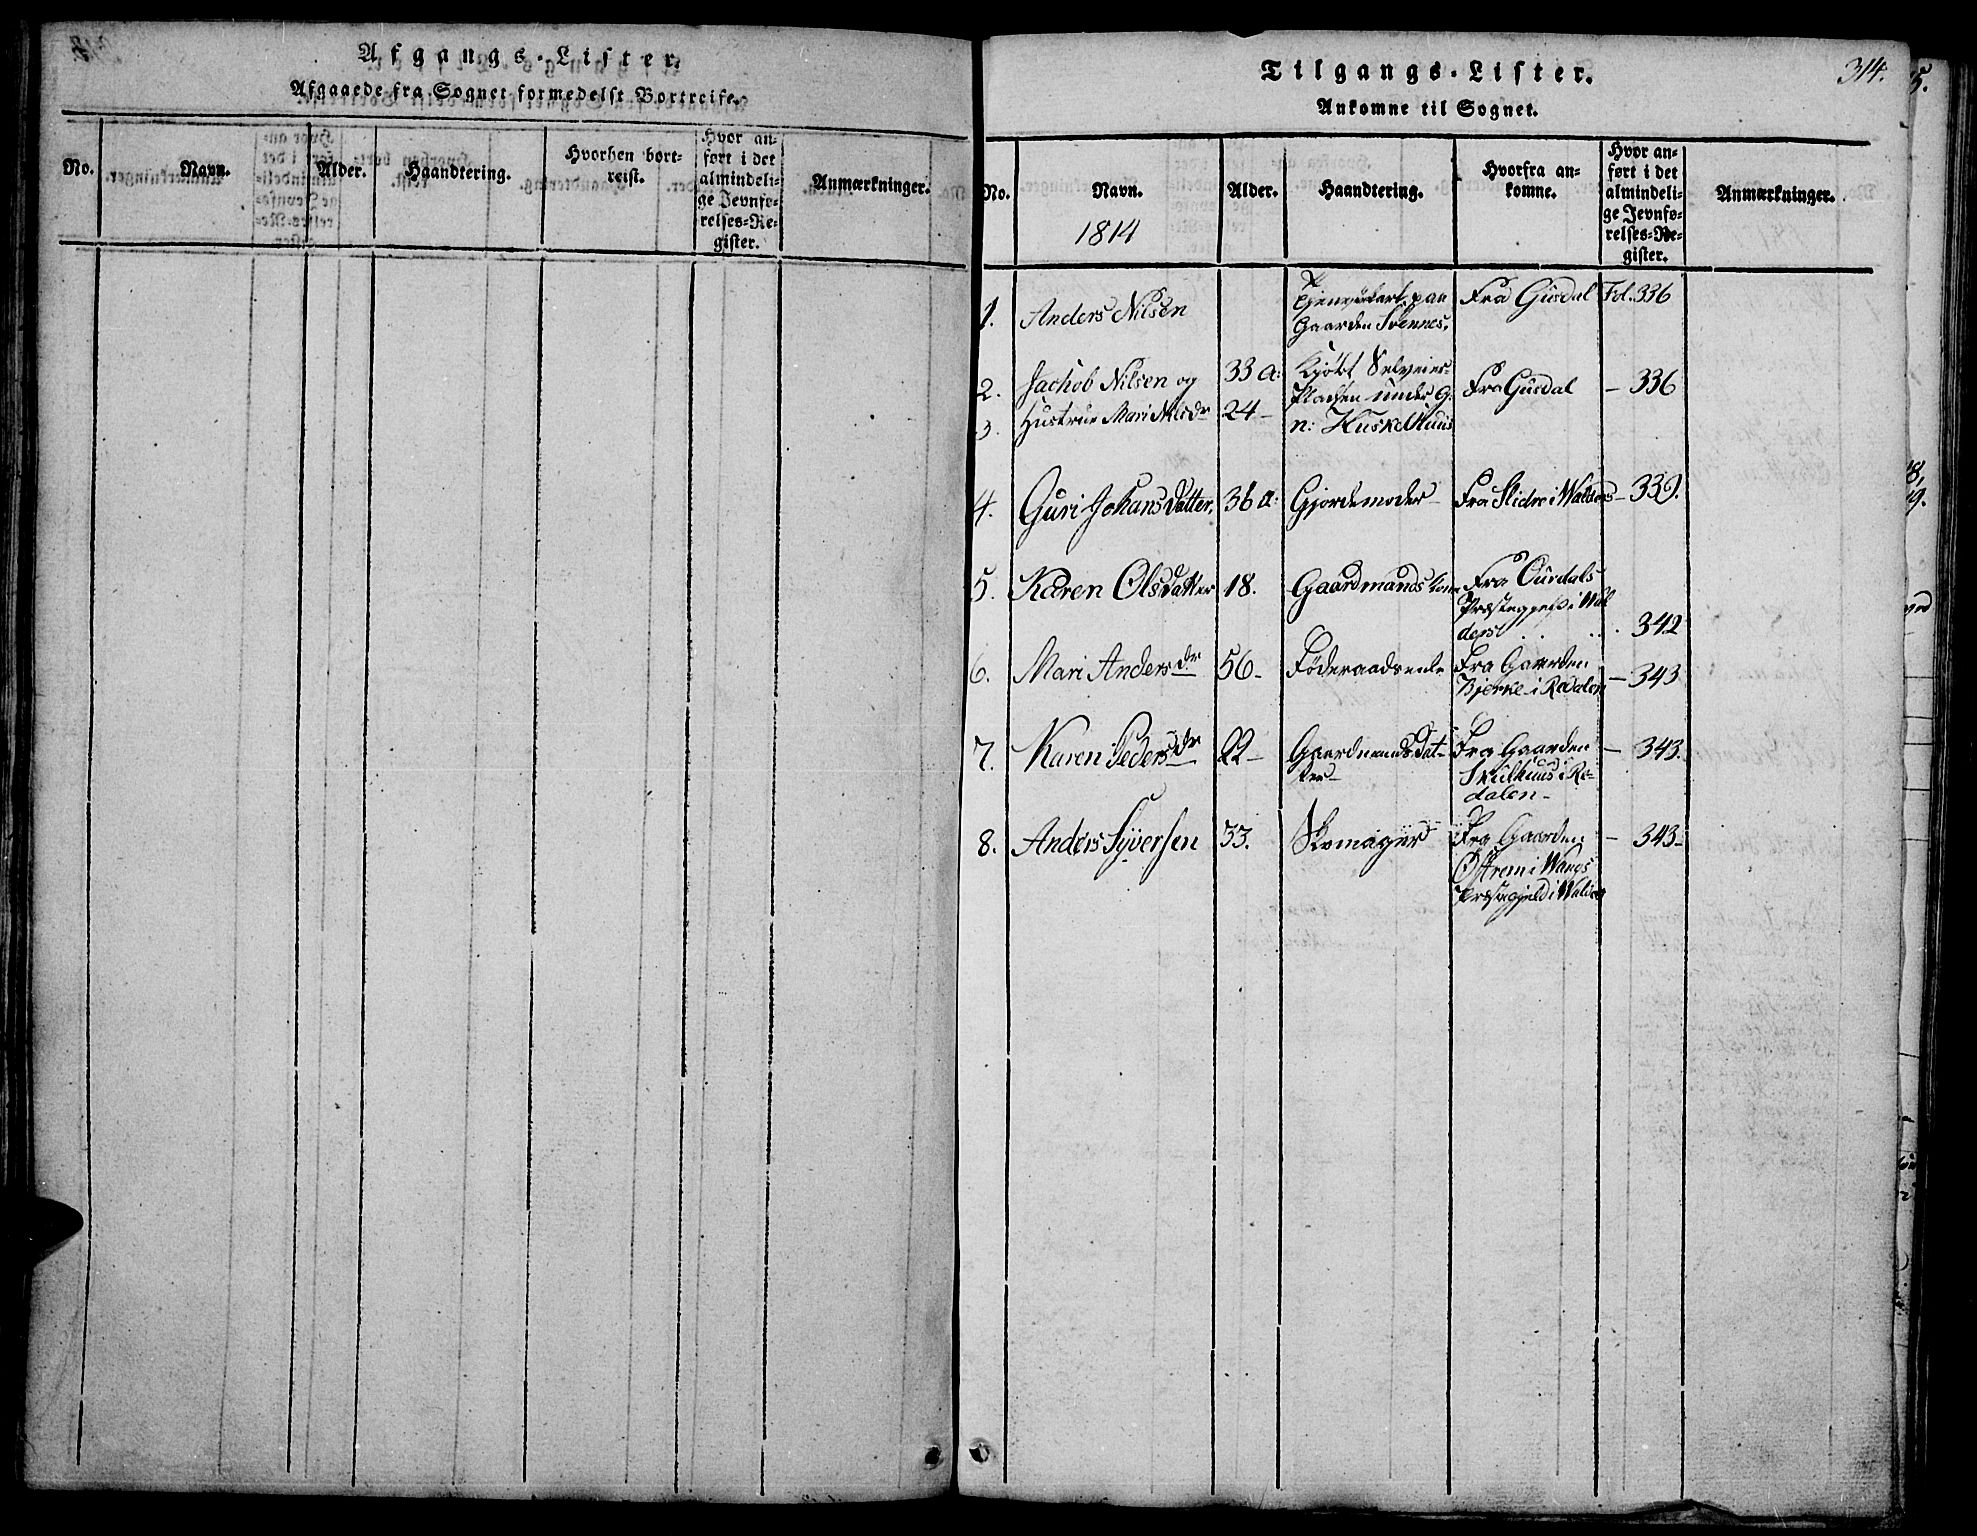 SAH, Biri prestekontor, Klokkerbok nr. 1, 1814-1828, s. 314